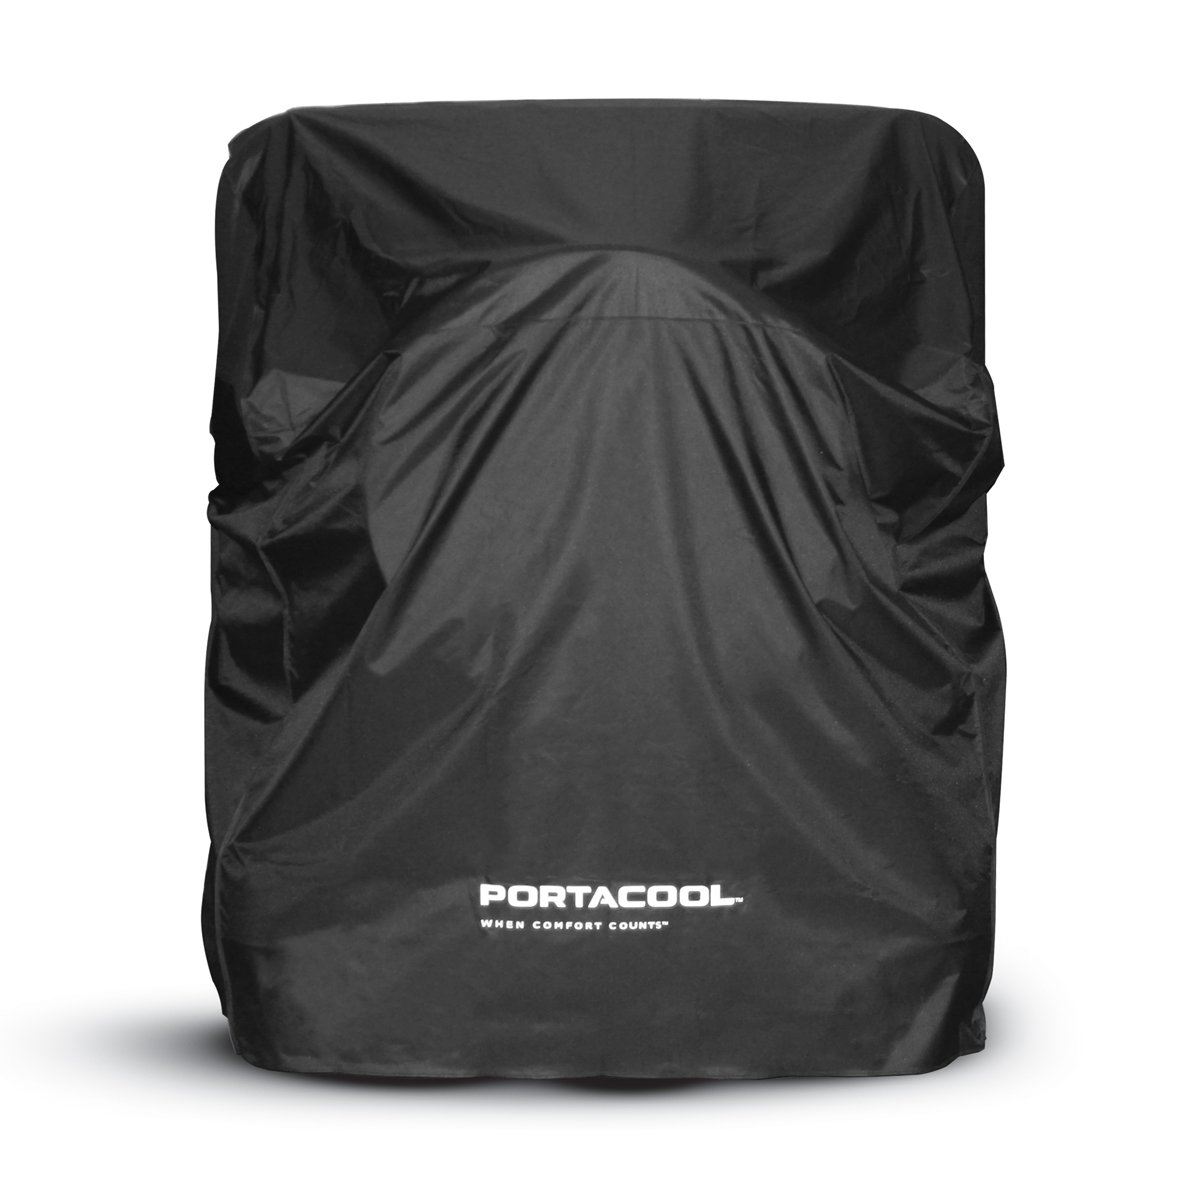 Portacool PARCVRJ26000 Replacement Protective Cover for Jetstream 260 Portable Evaporative Cooler